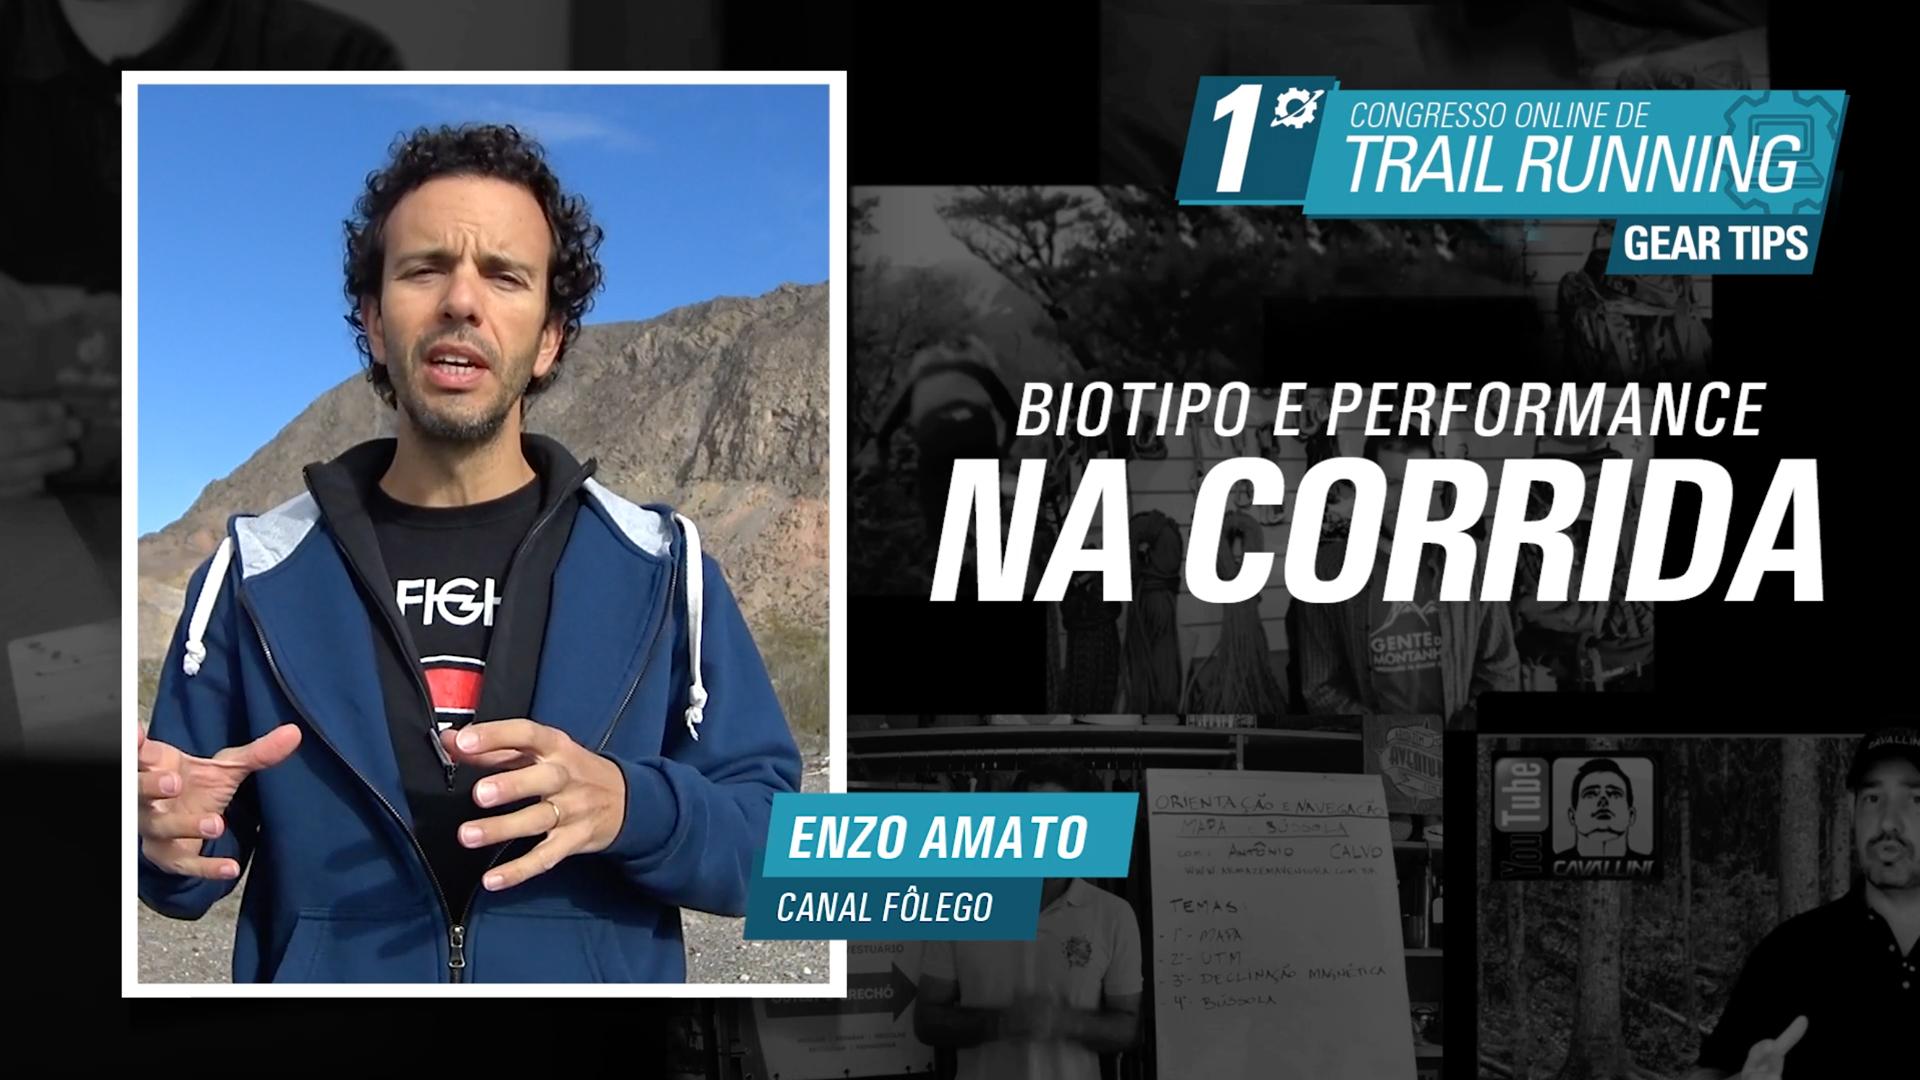 Biotipo e Performance na Corrida - Enzo Amato